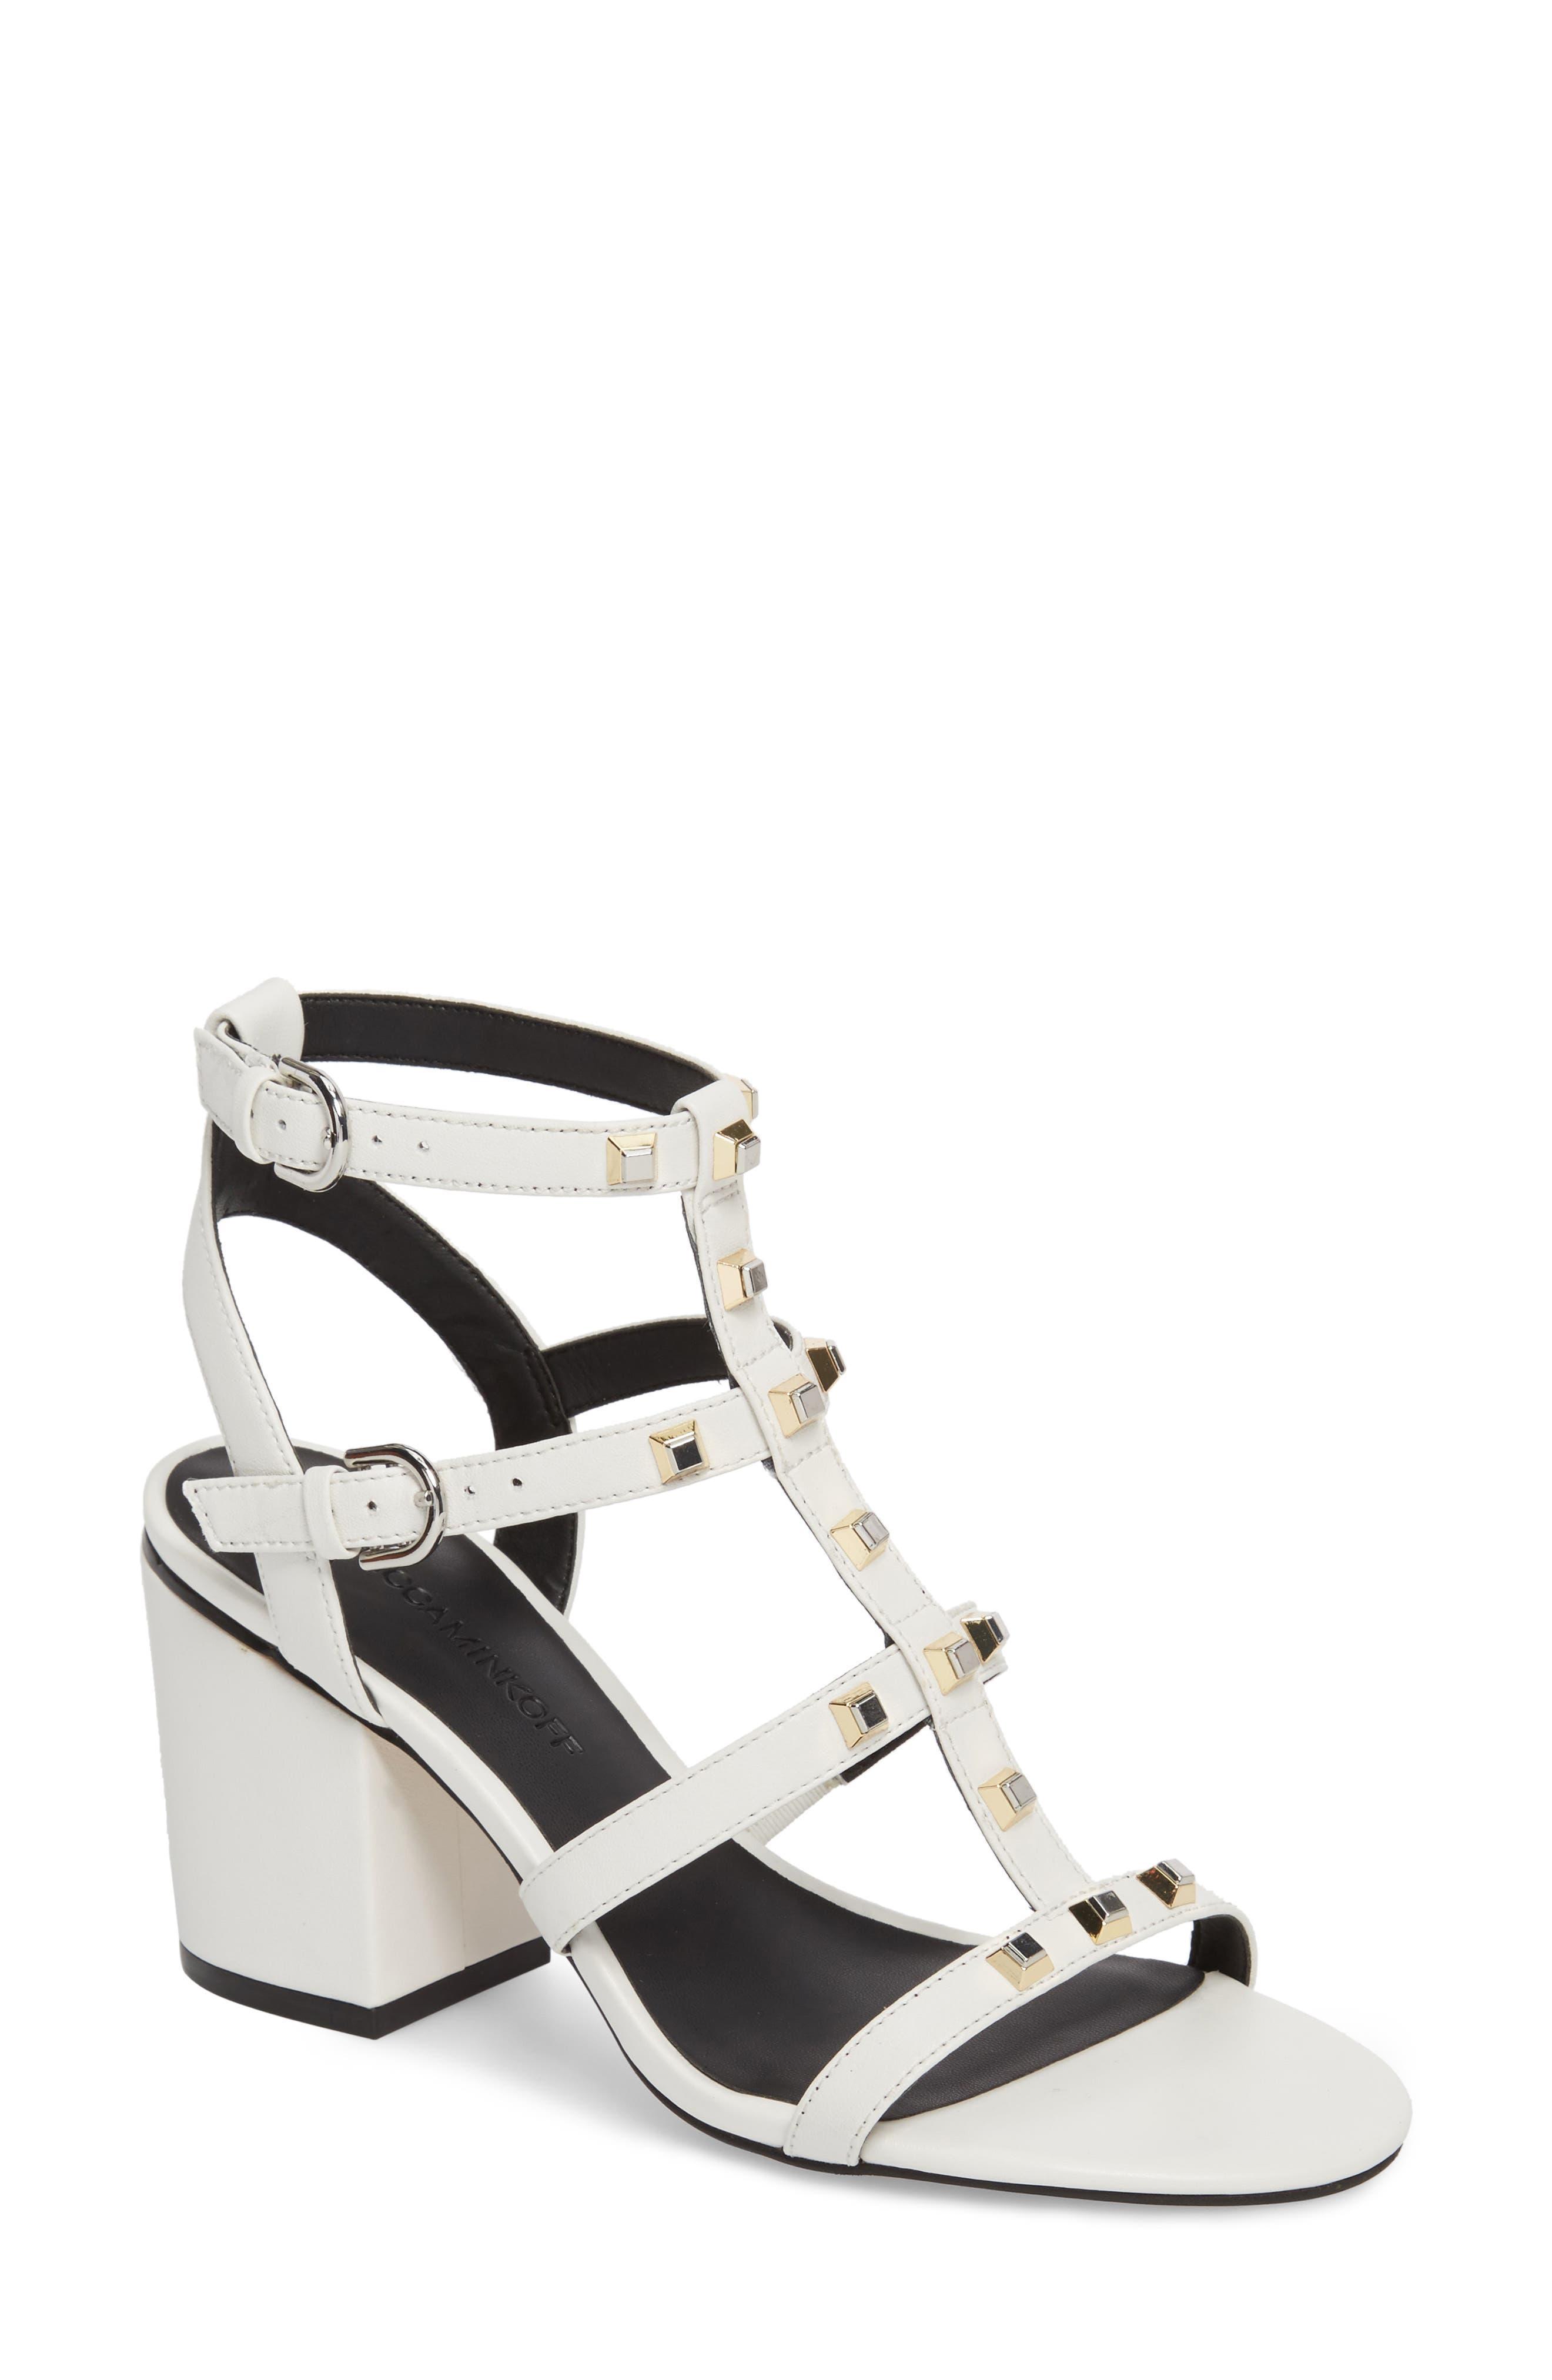 Lenore Sandal,                         Main,                         color, Optic White Leather